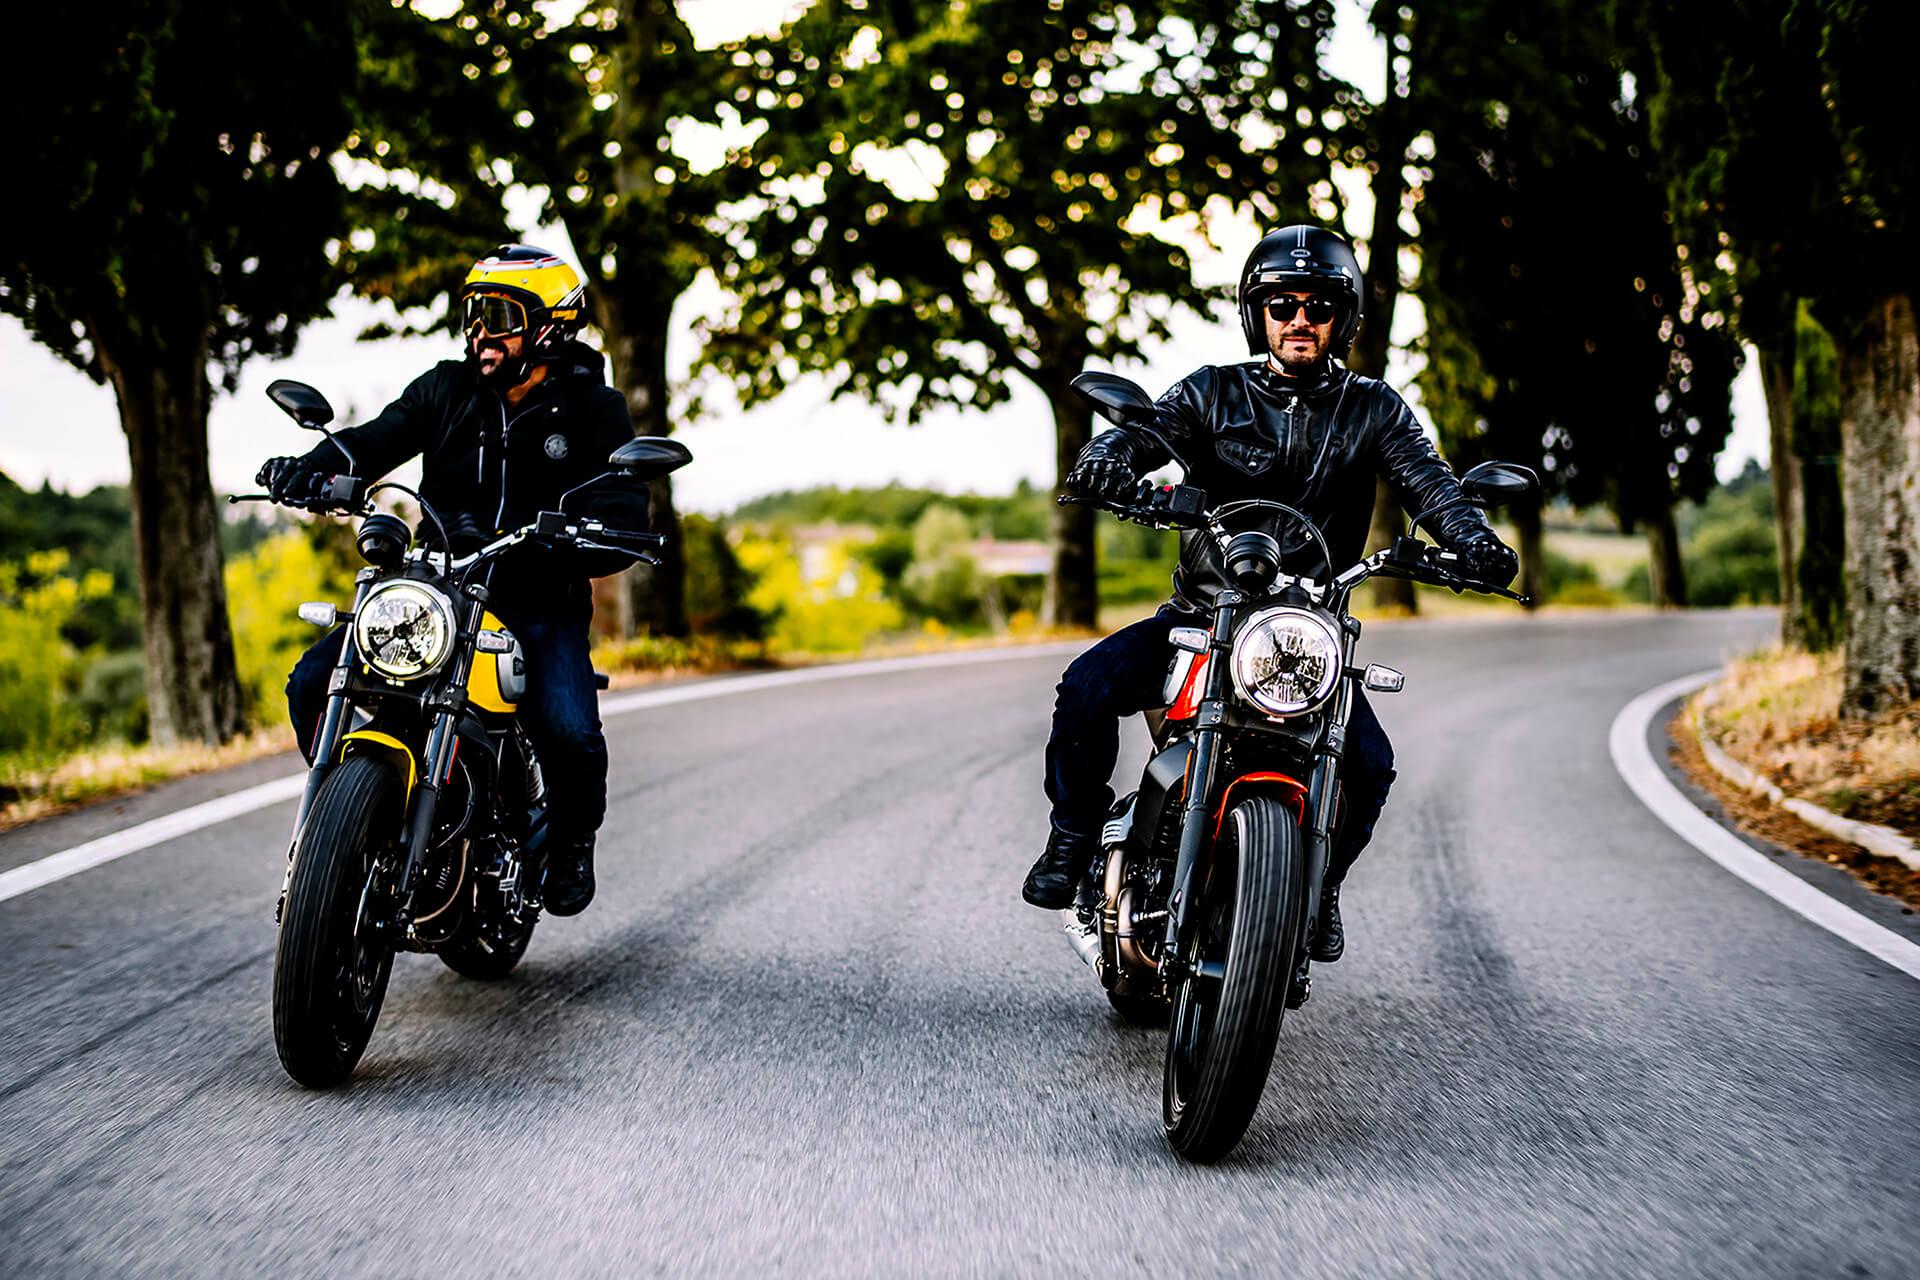 Scrambler Ducati - Καμπάνια END OF SEASON με προσφορές υψηλών ταχυτήτων